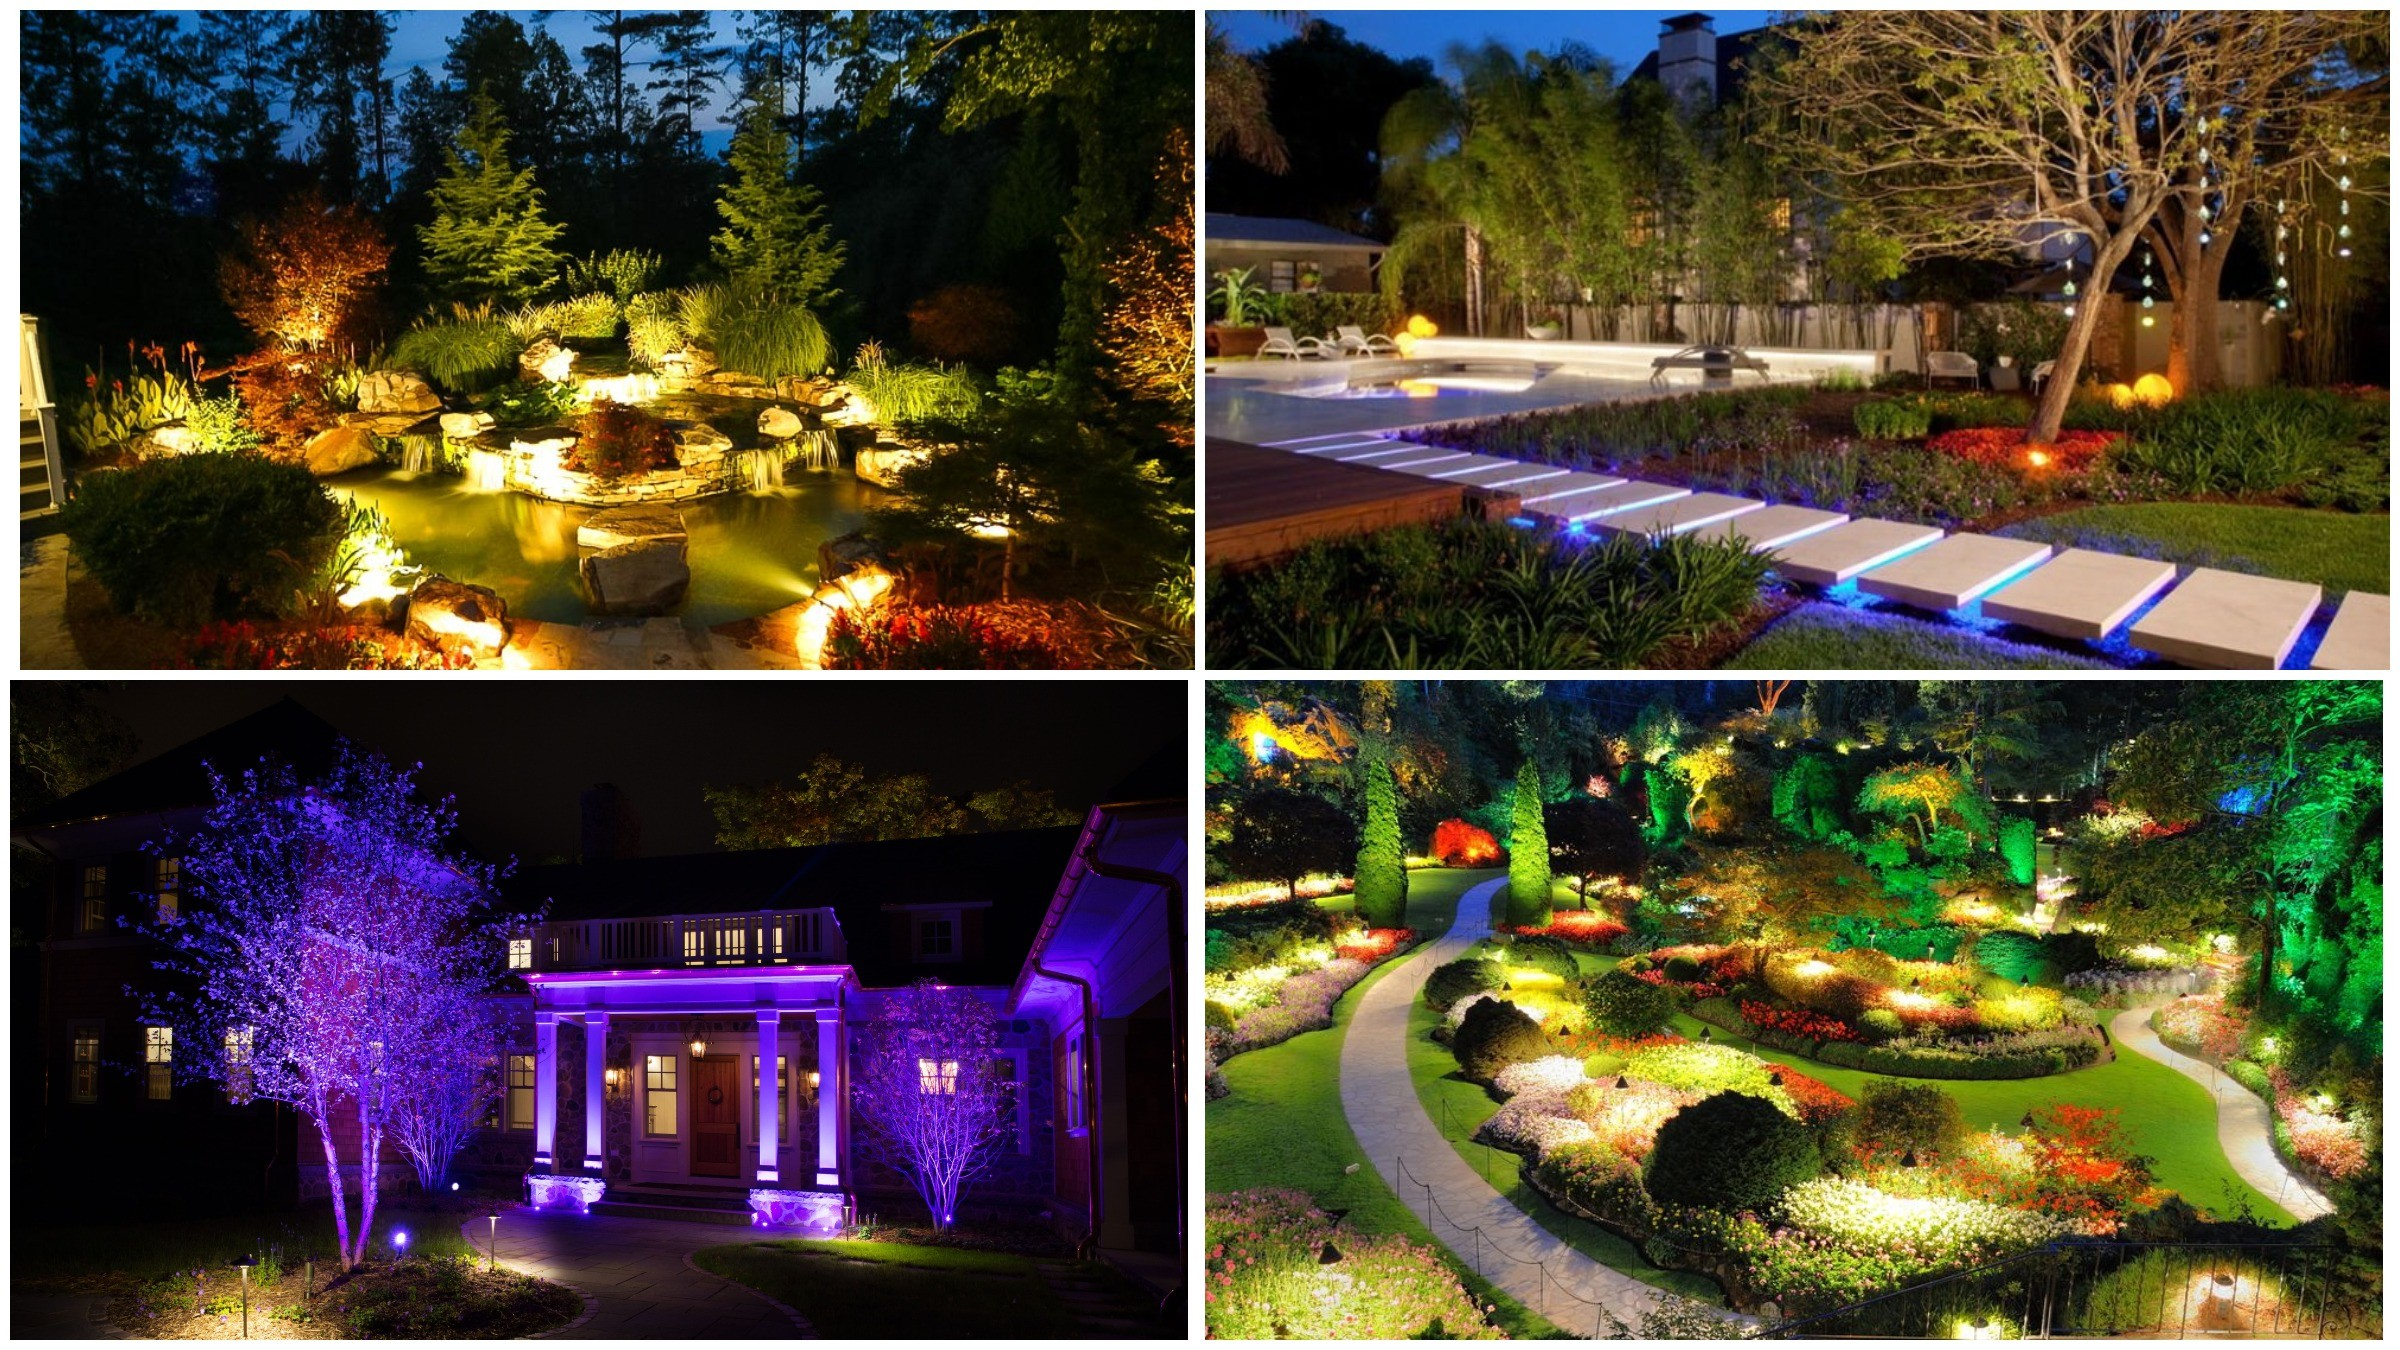 изображение разнообразия подсветок парка и сада